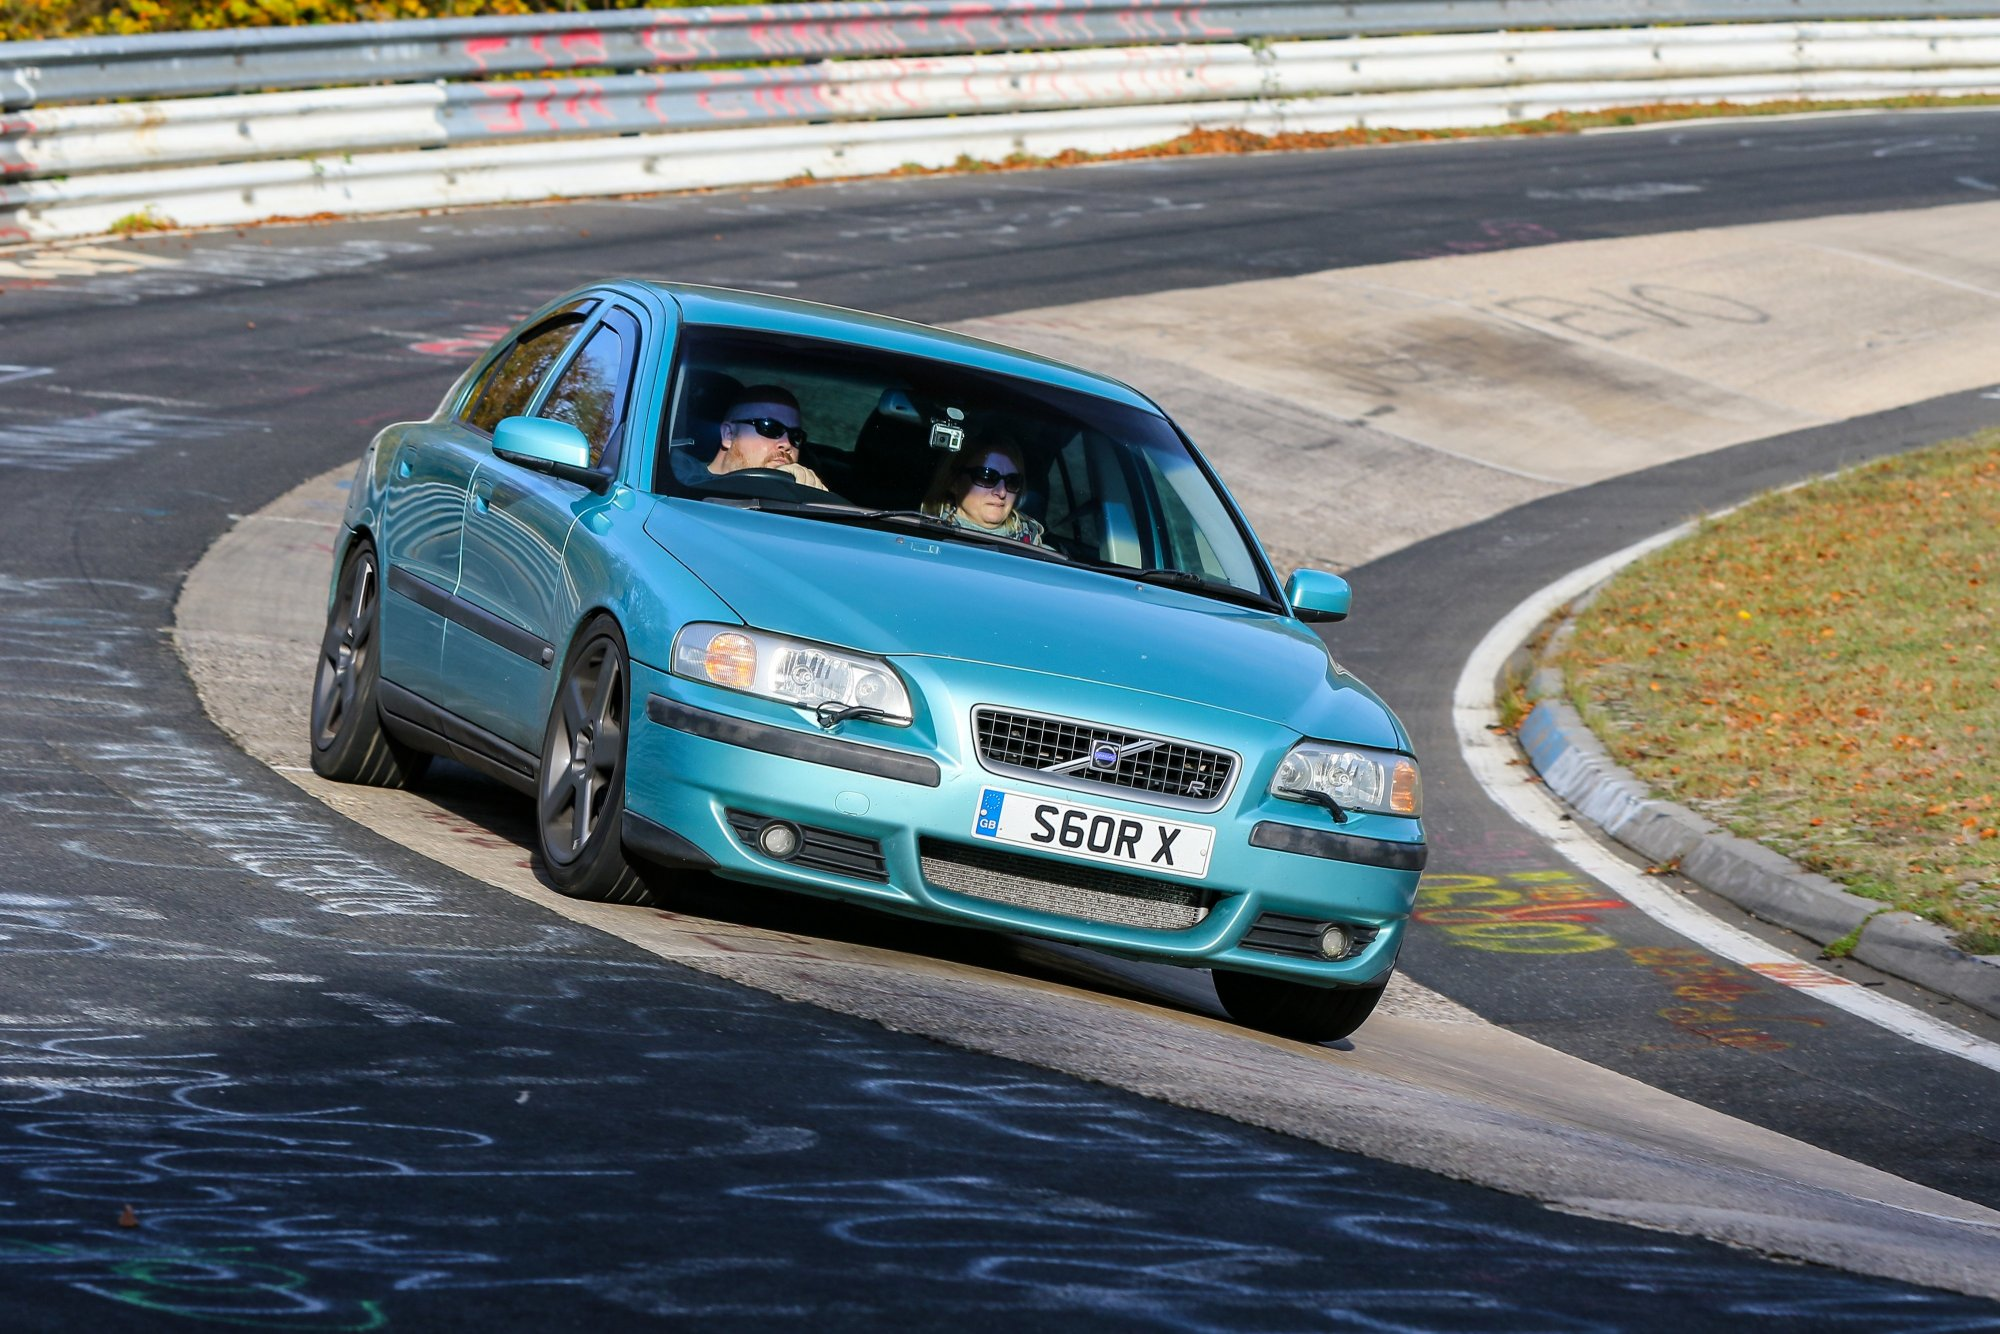 racetracker_5546380_83964.thumb.jpg.ed5d39d31299ee3769ed90459f008a7a.jpg